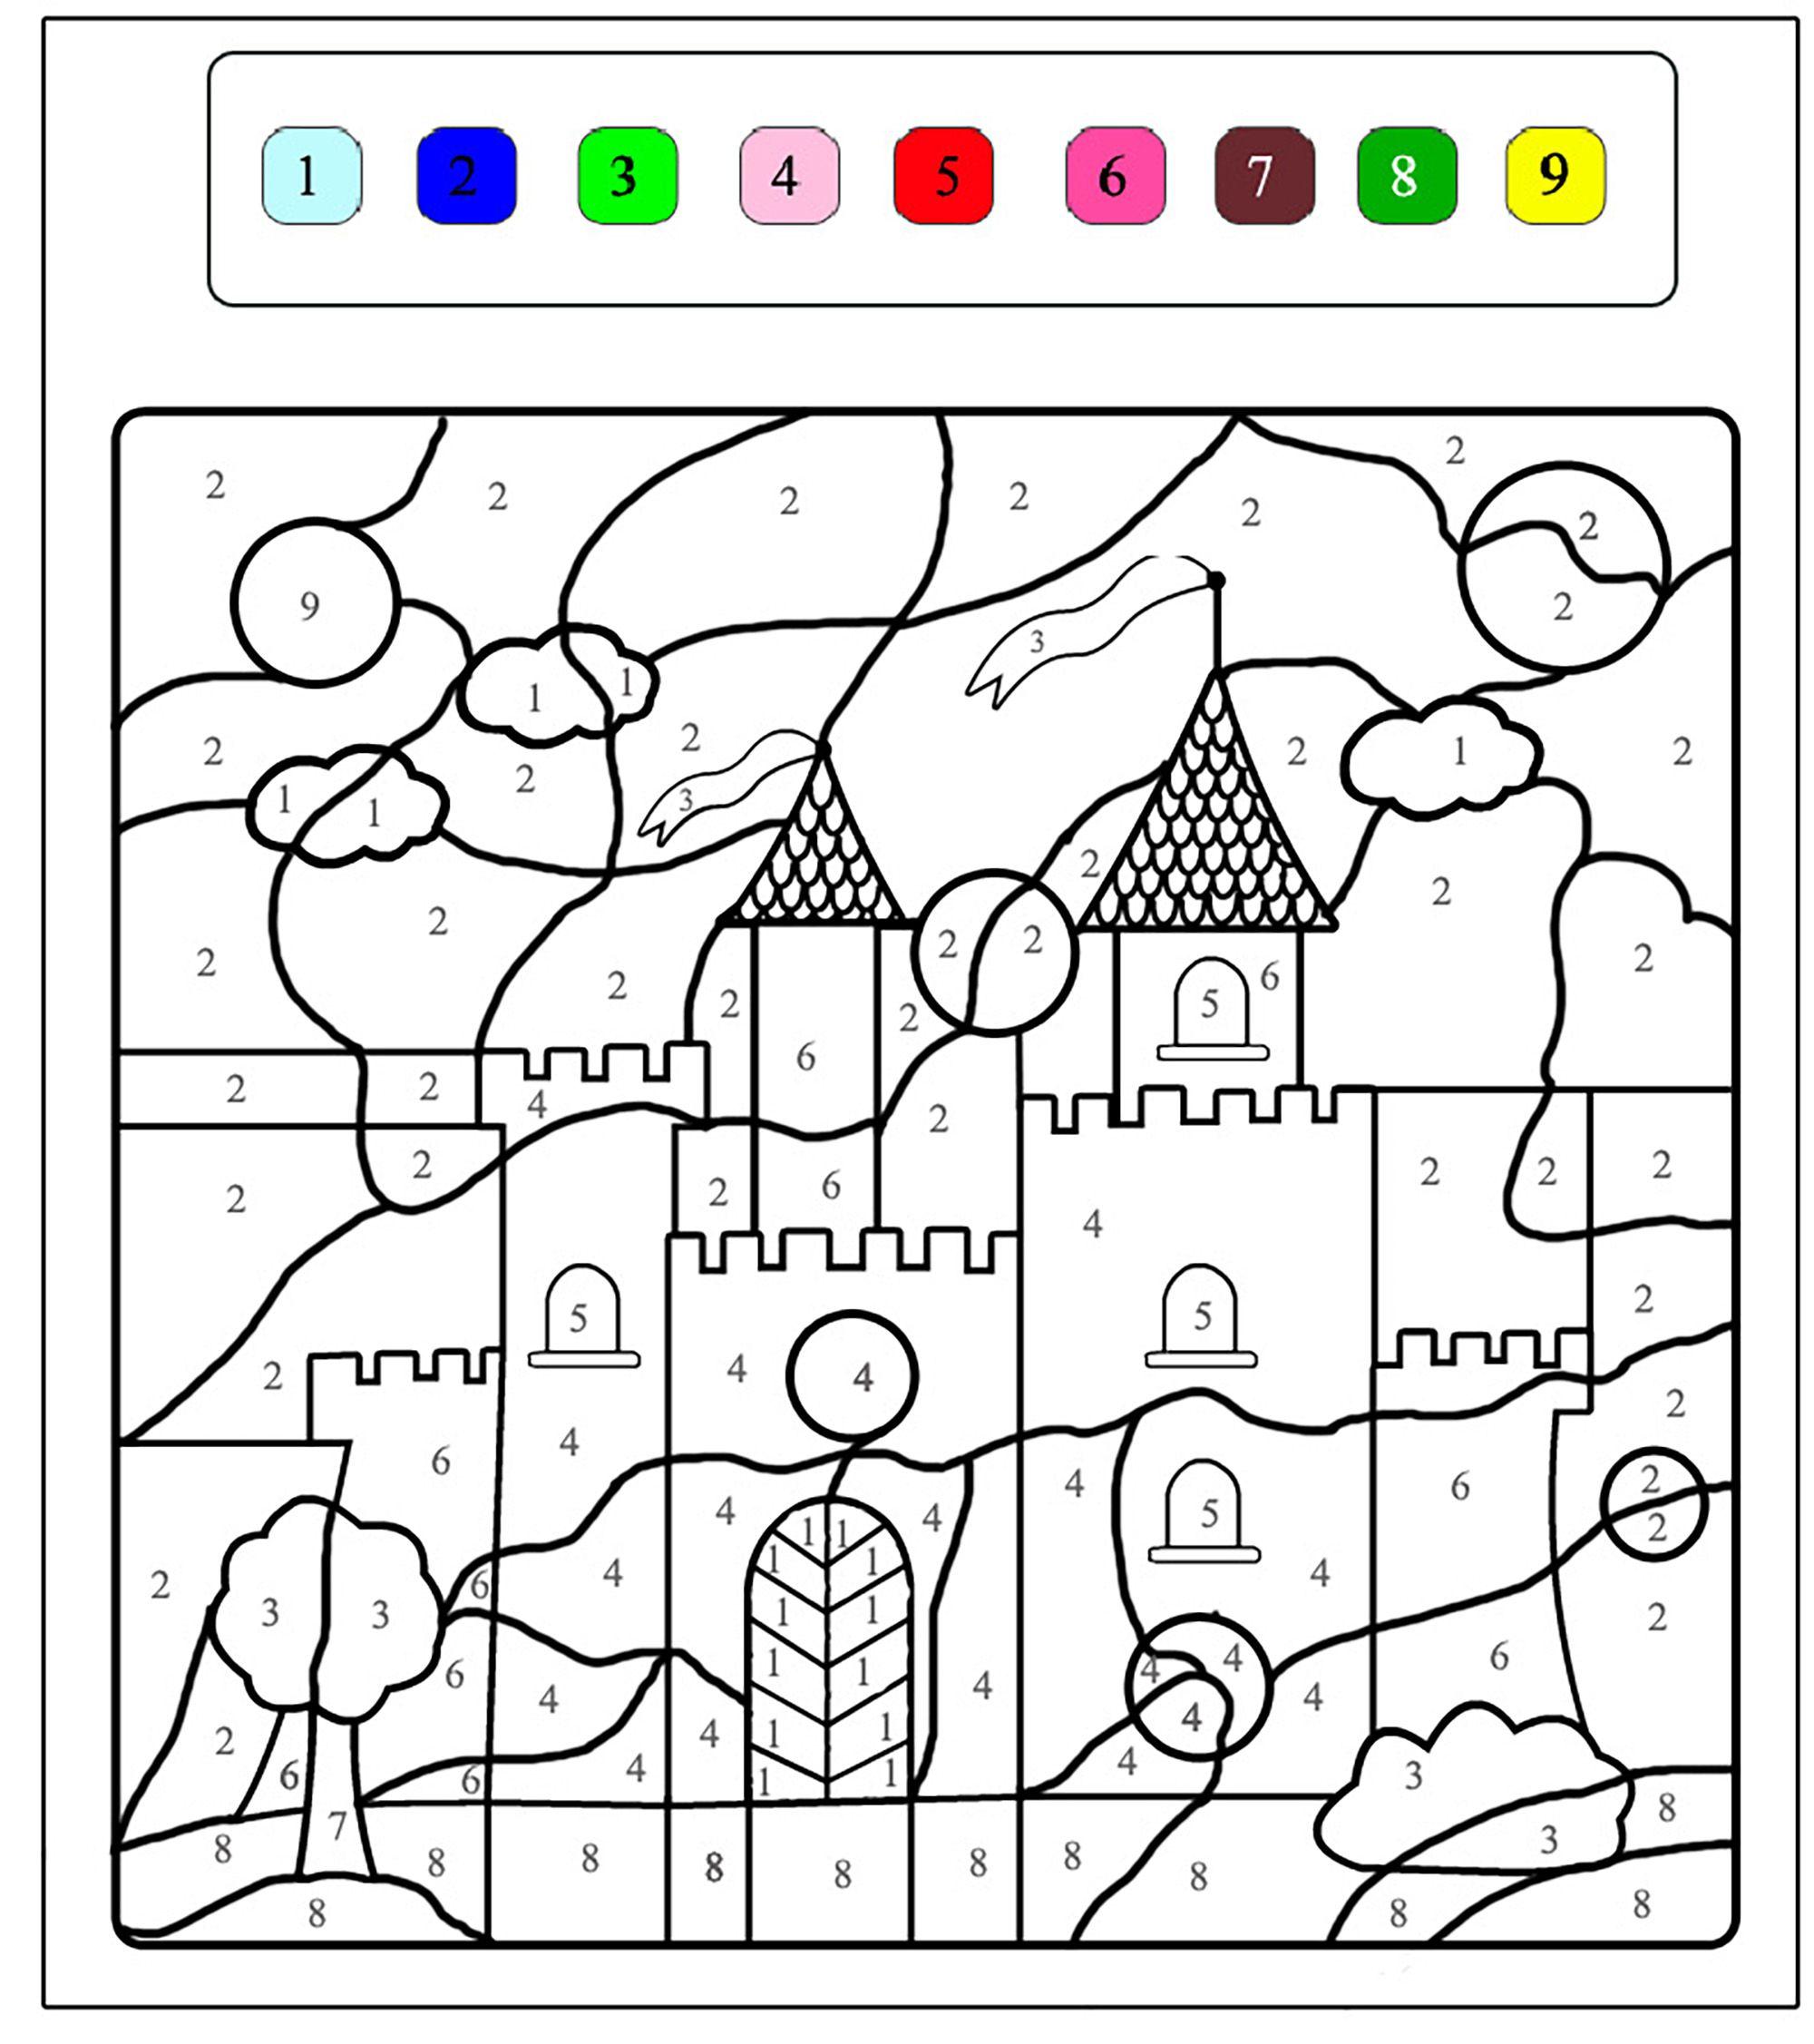 Magical Coloring Pages For Kids To Print Color Ridders Kleuren Met Nummers Prinsessenfeestje Spelletjes